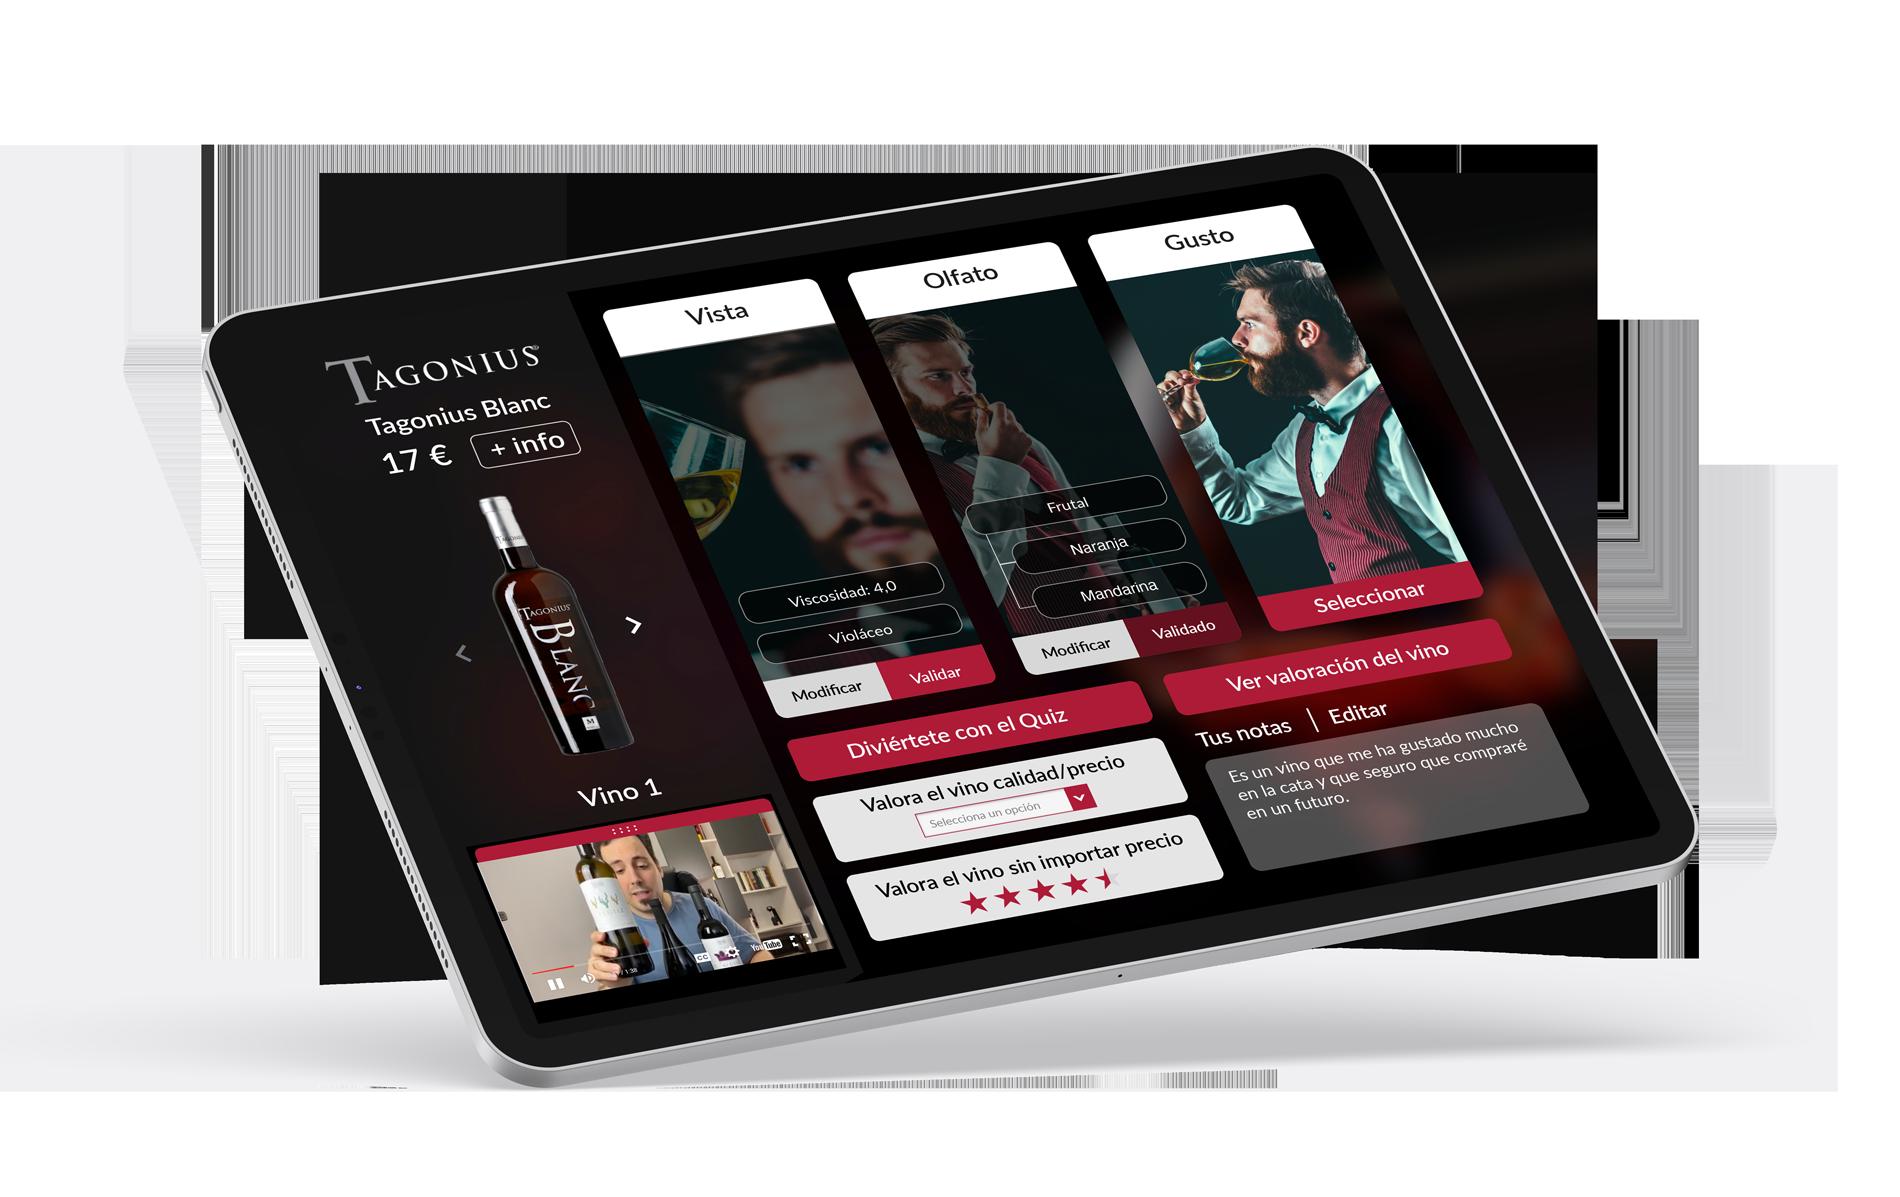 ipad upwine app - DISEÑO DIGITAL PARA STARTUP DE CATAS DE VINO ONLINE